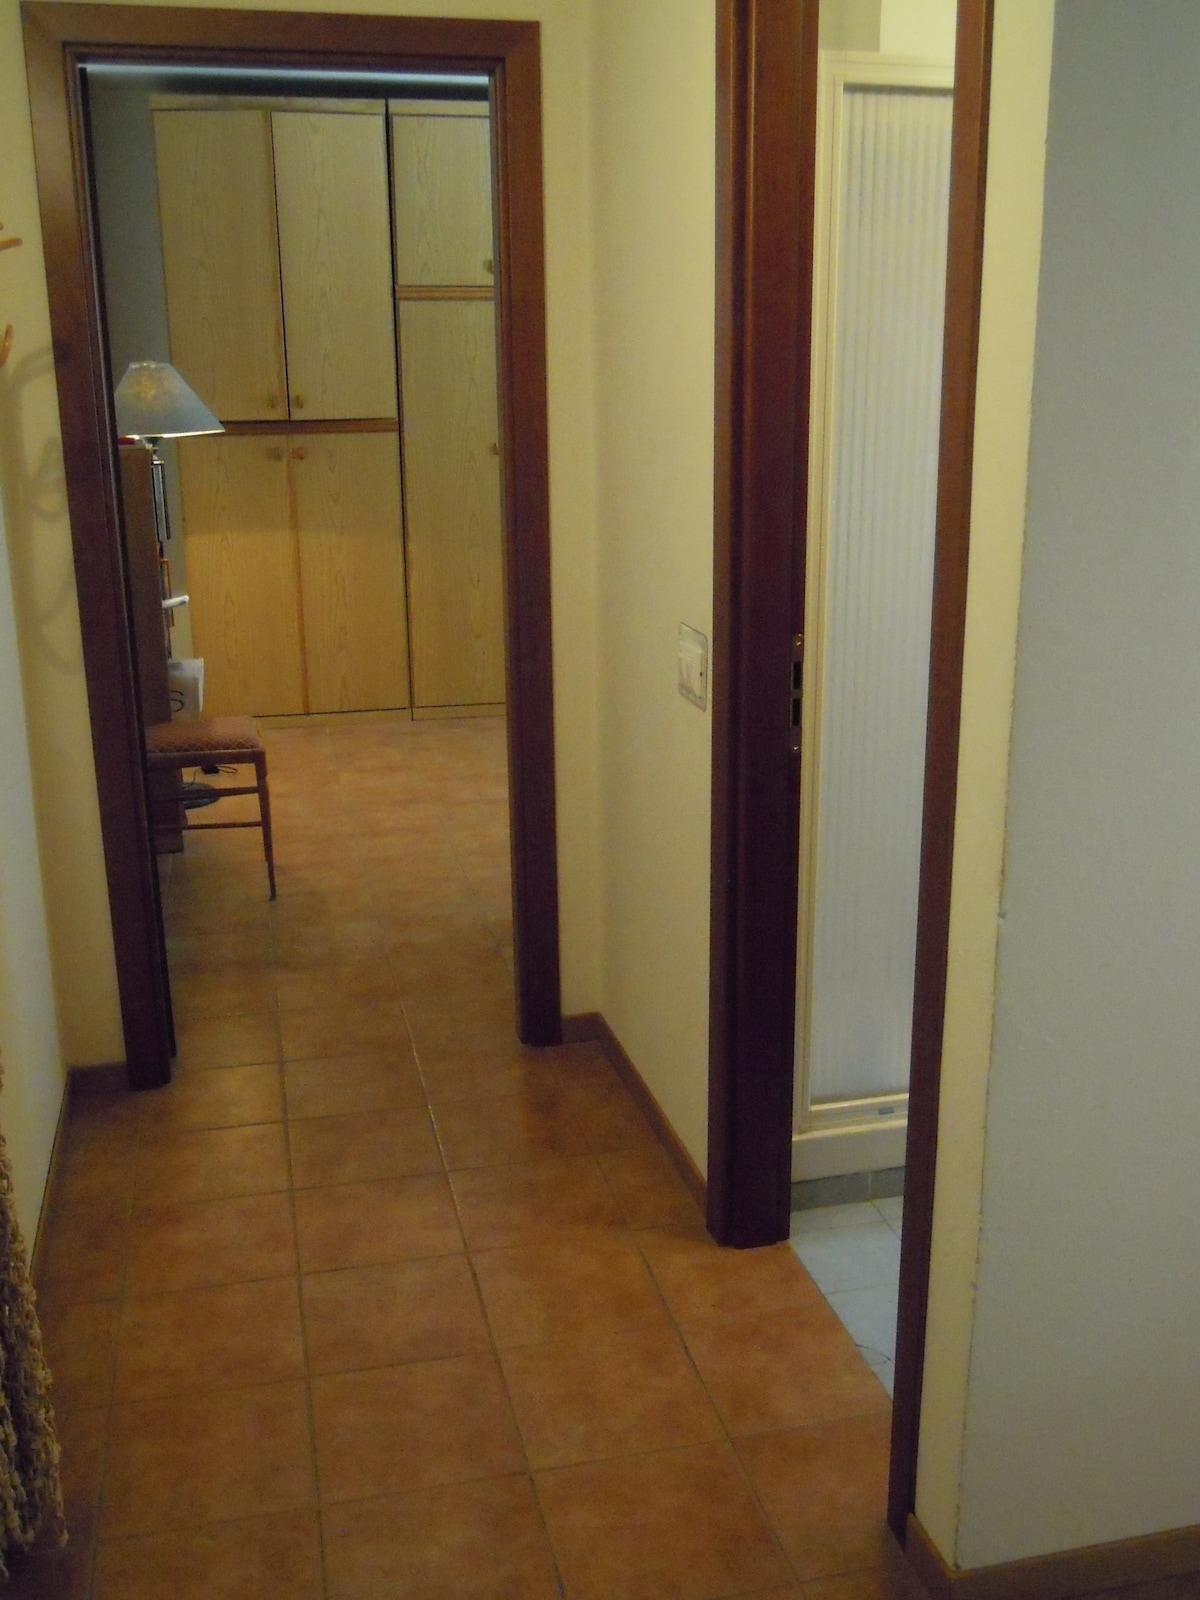 Small corridor - on the right: bathroom; straight: bedroom